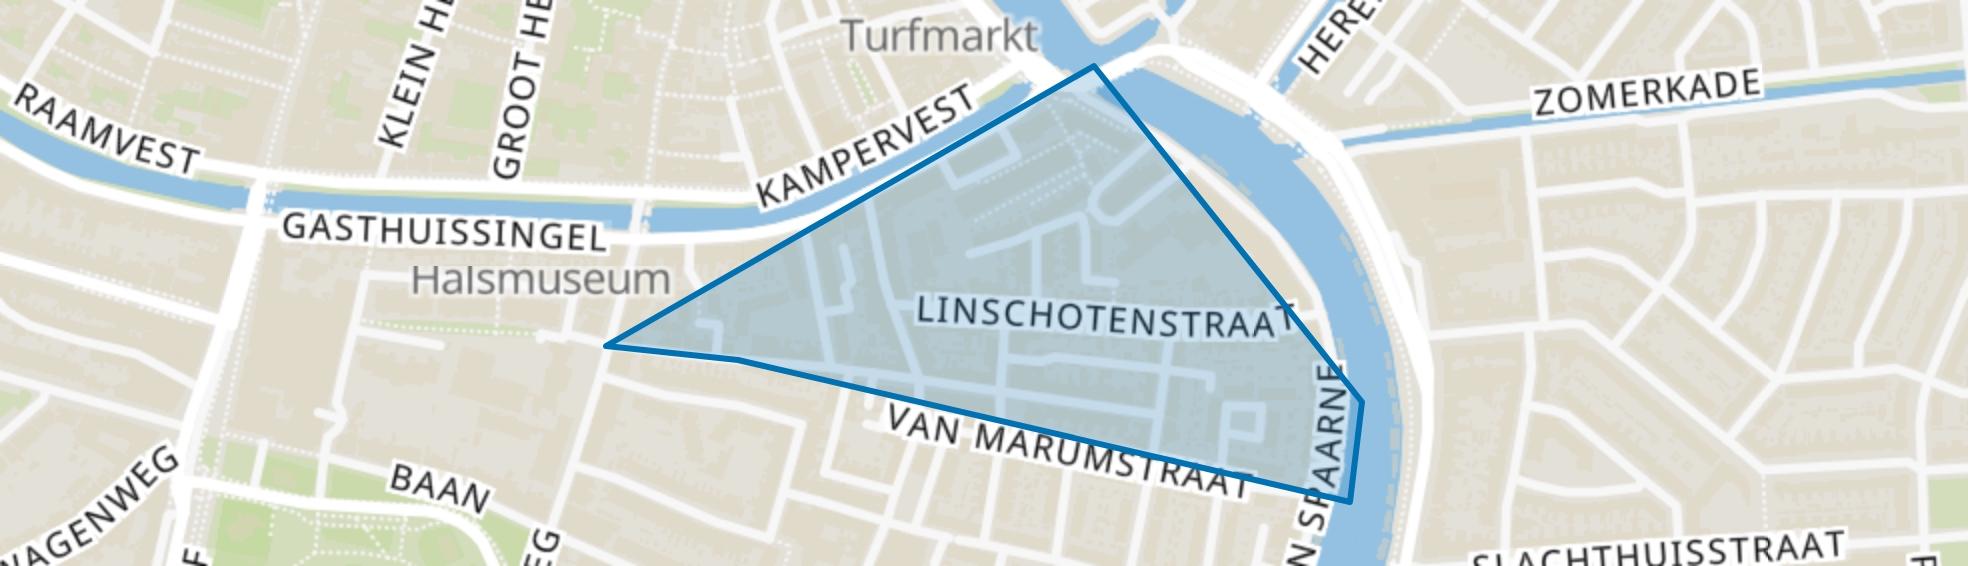 Rozenprieel-noord, Haarlem map